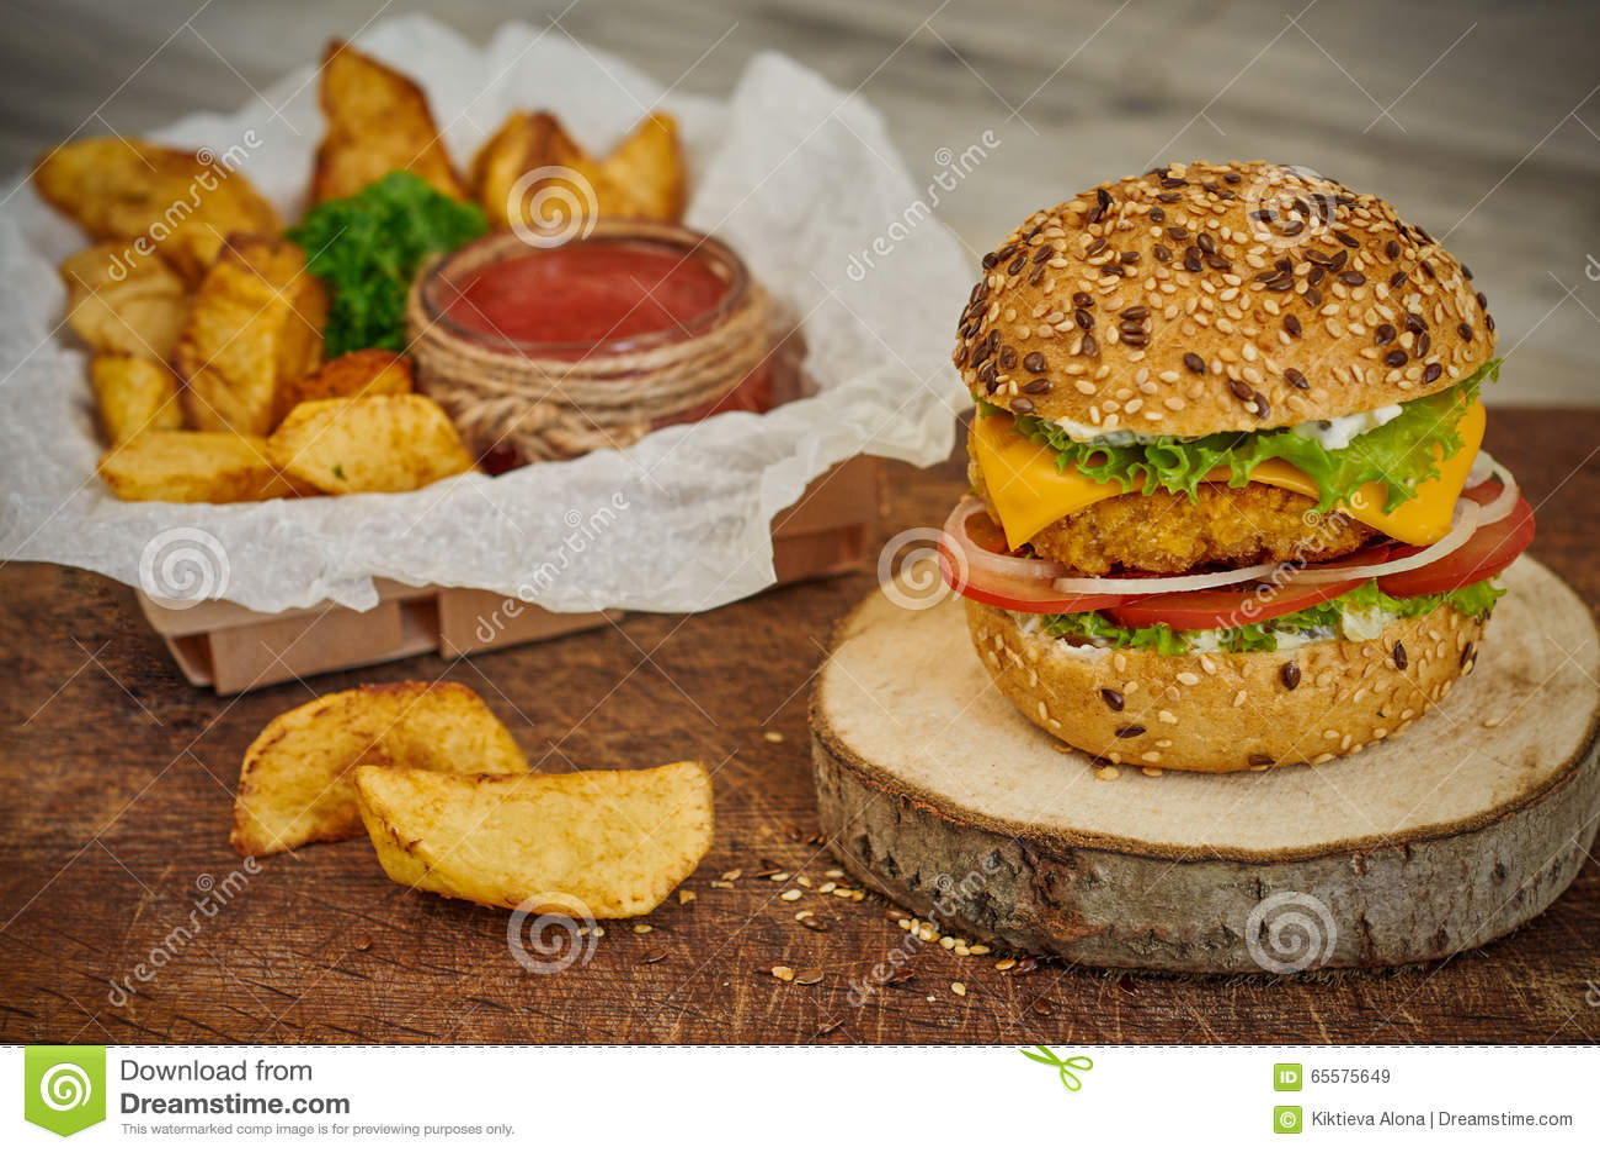 A HOME fêz o hamburguer